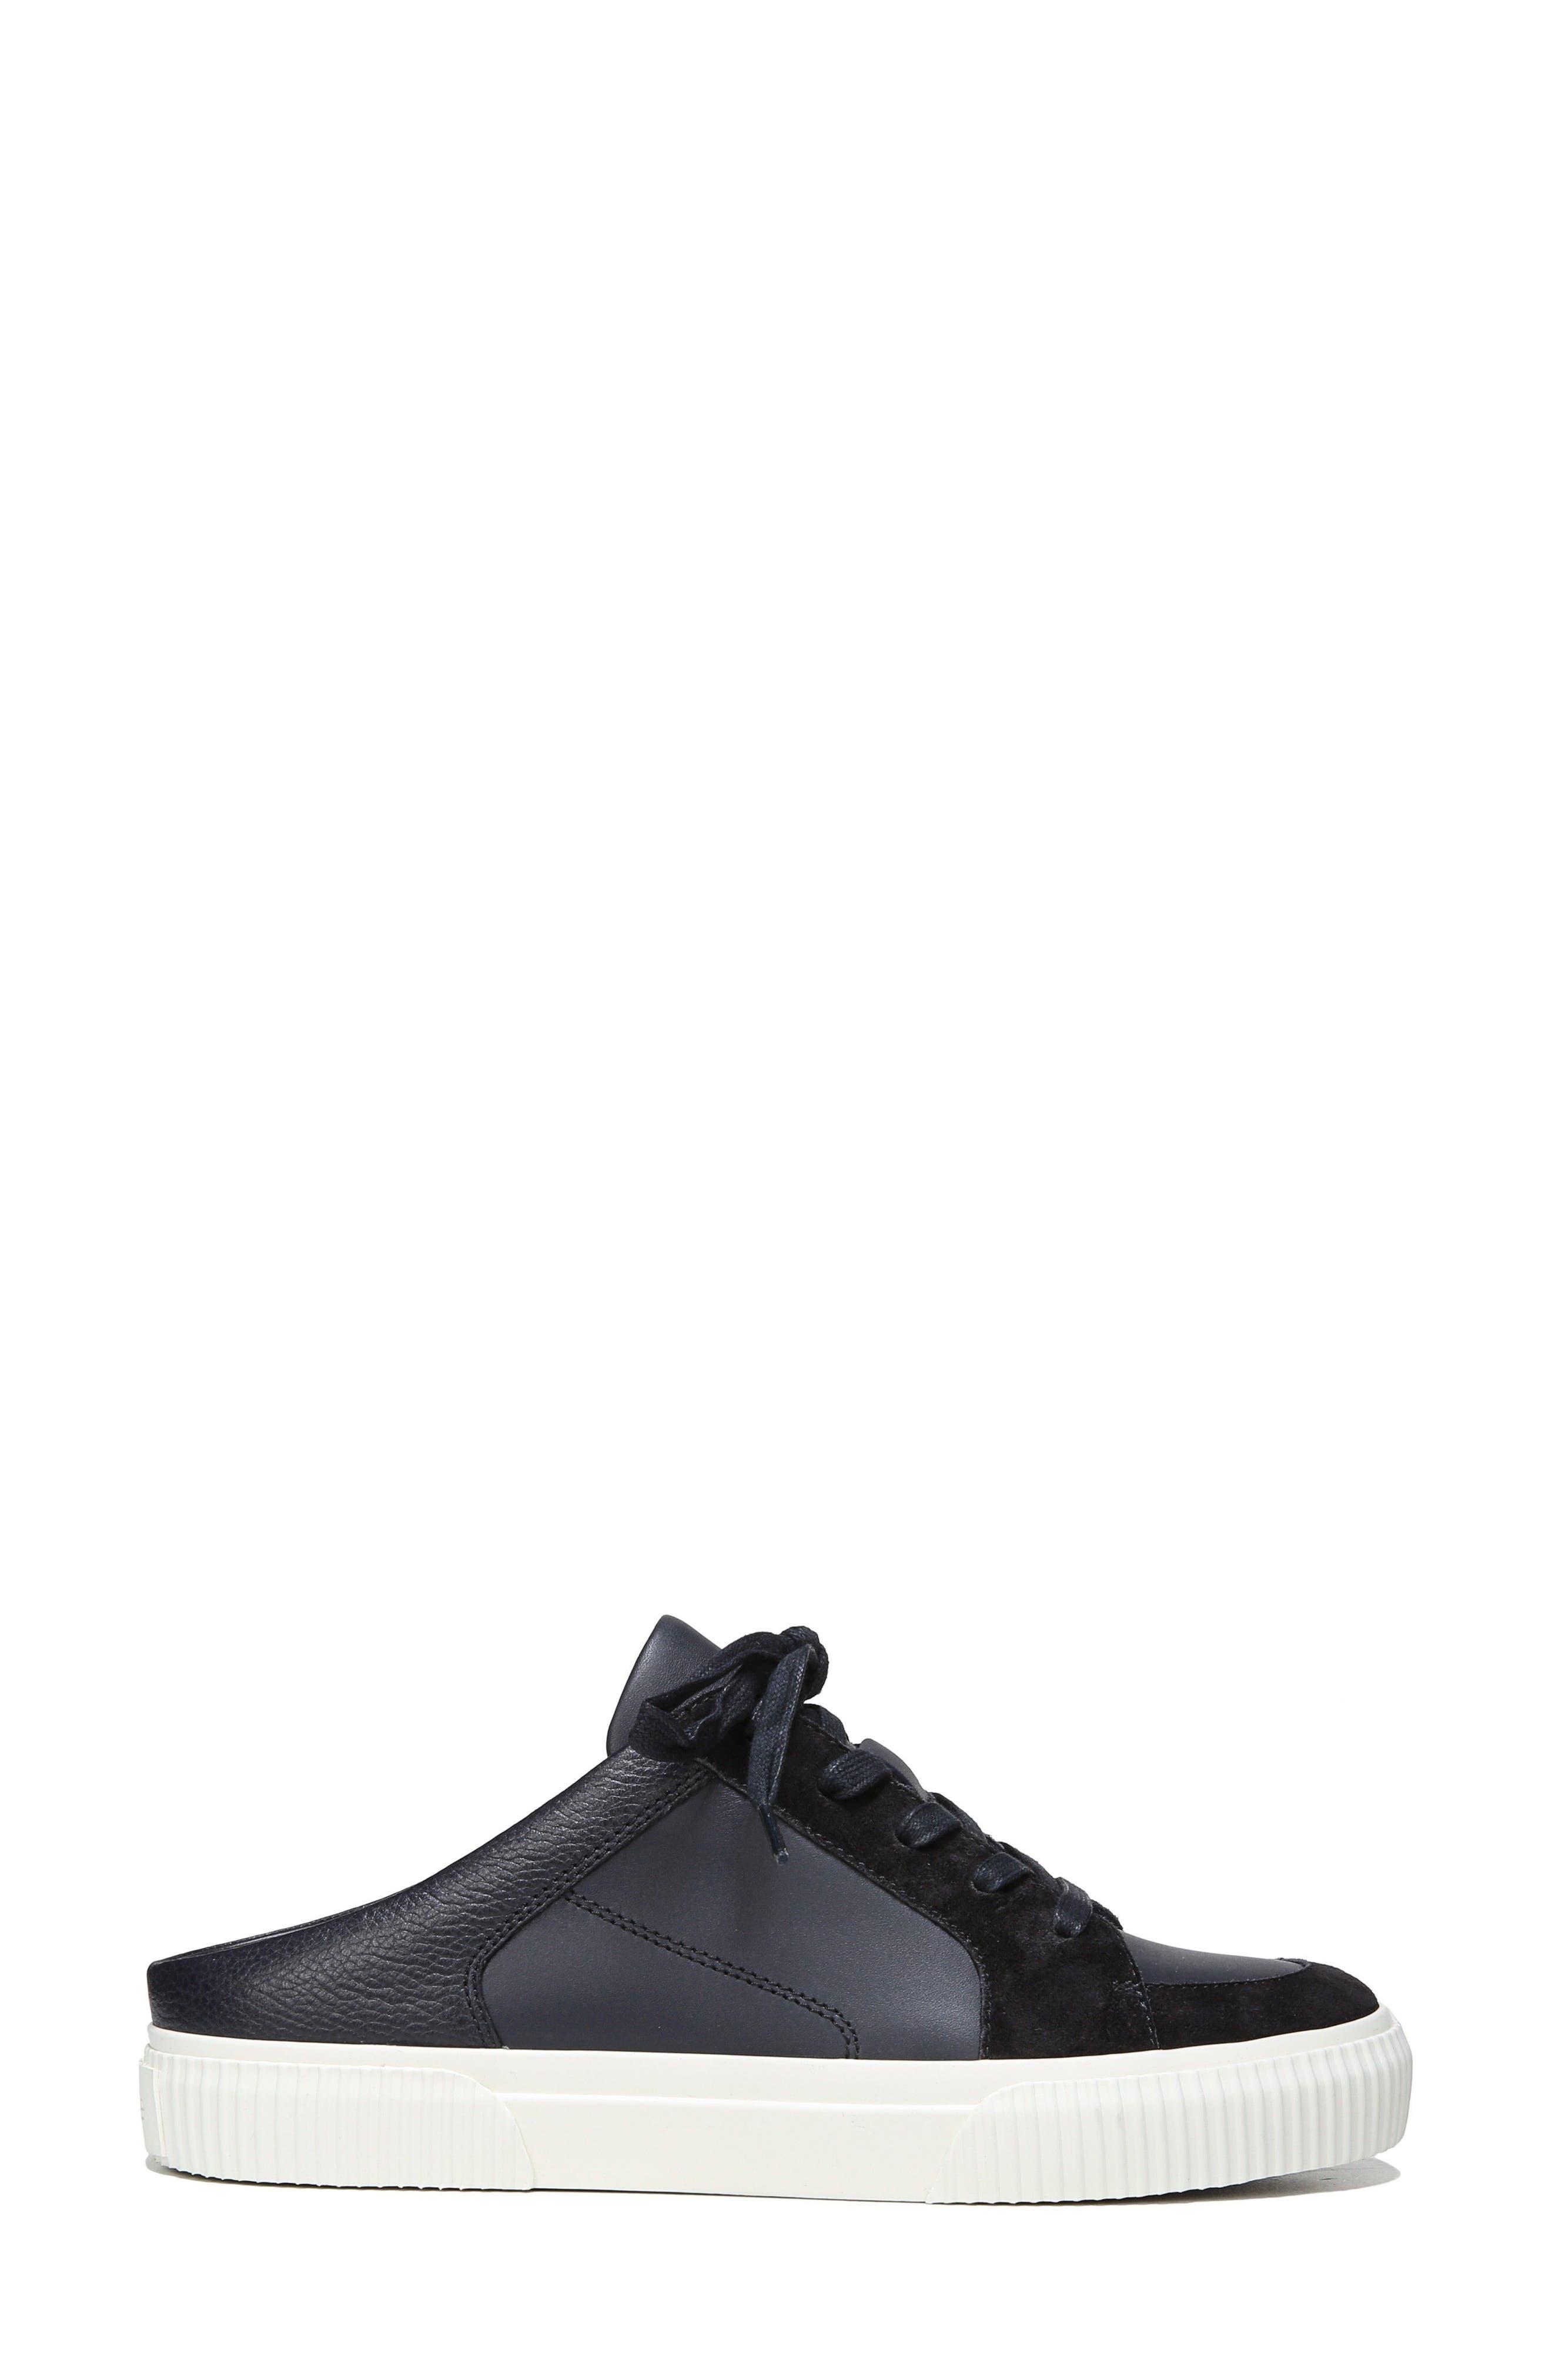 Kess Slip-On Sneaker,                             Alternate thumbnail 3, color,                             Coastal